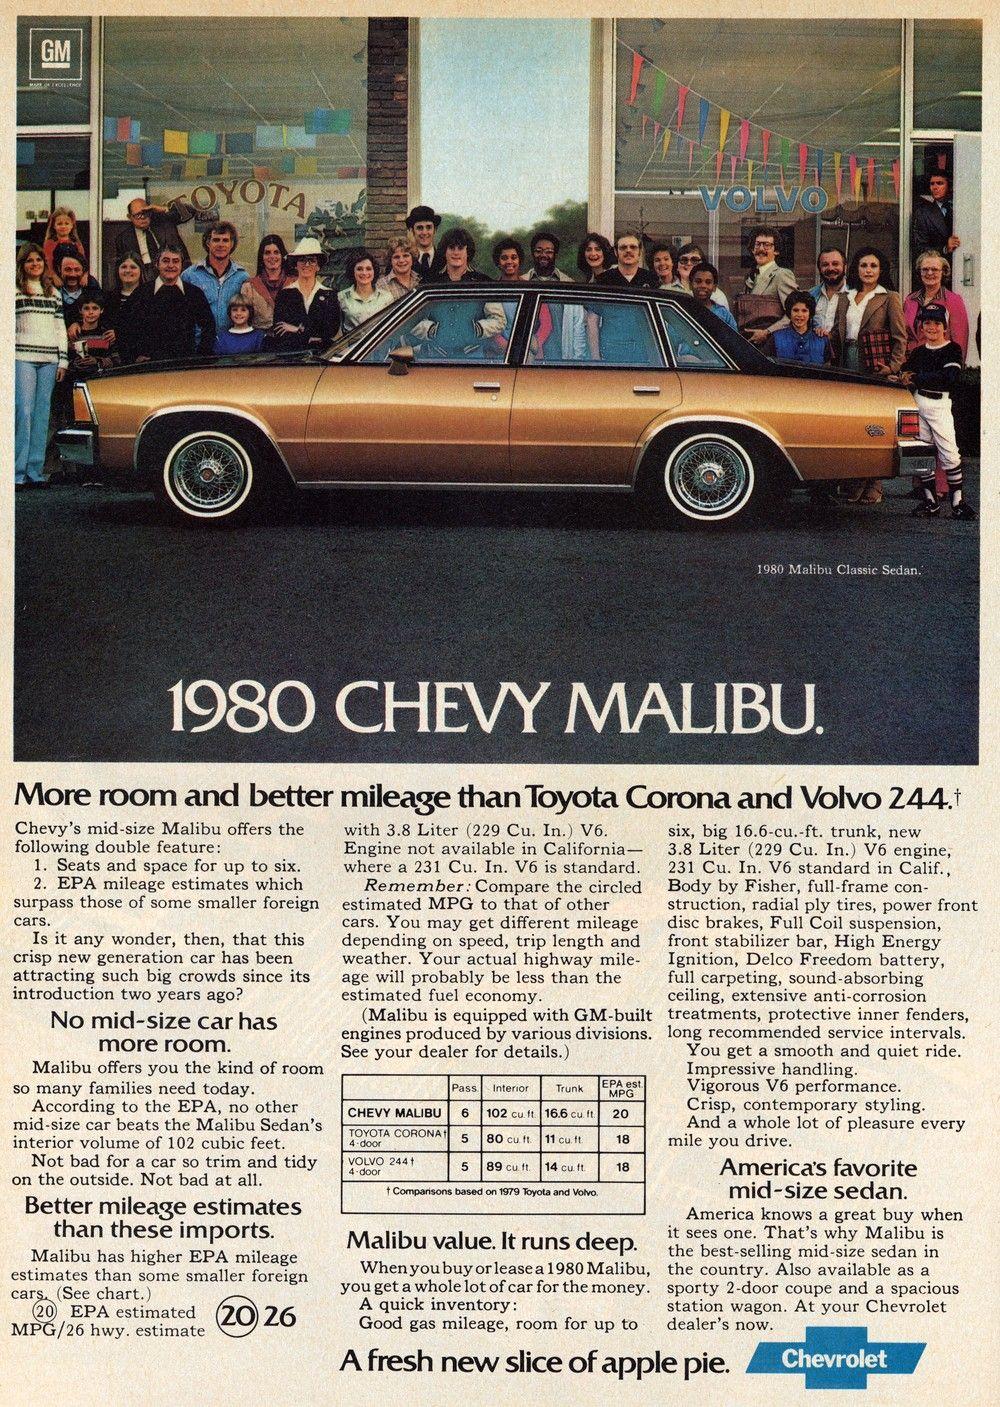 Malibu 1980 chevrolet malibu listings : 1980 chevrolet malibu tuscon, AZ lowrider beauty | CARS ...